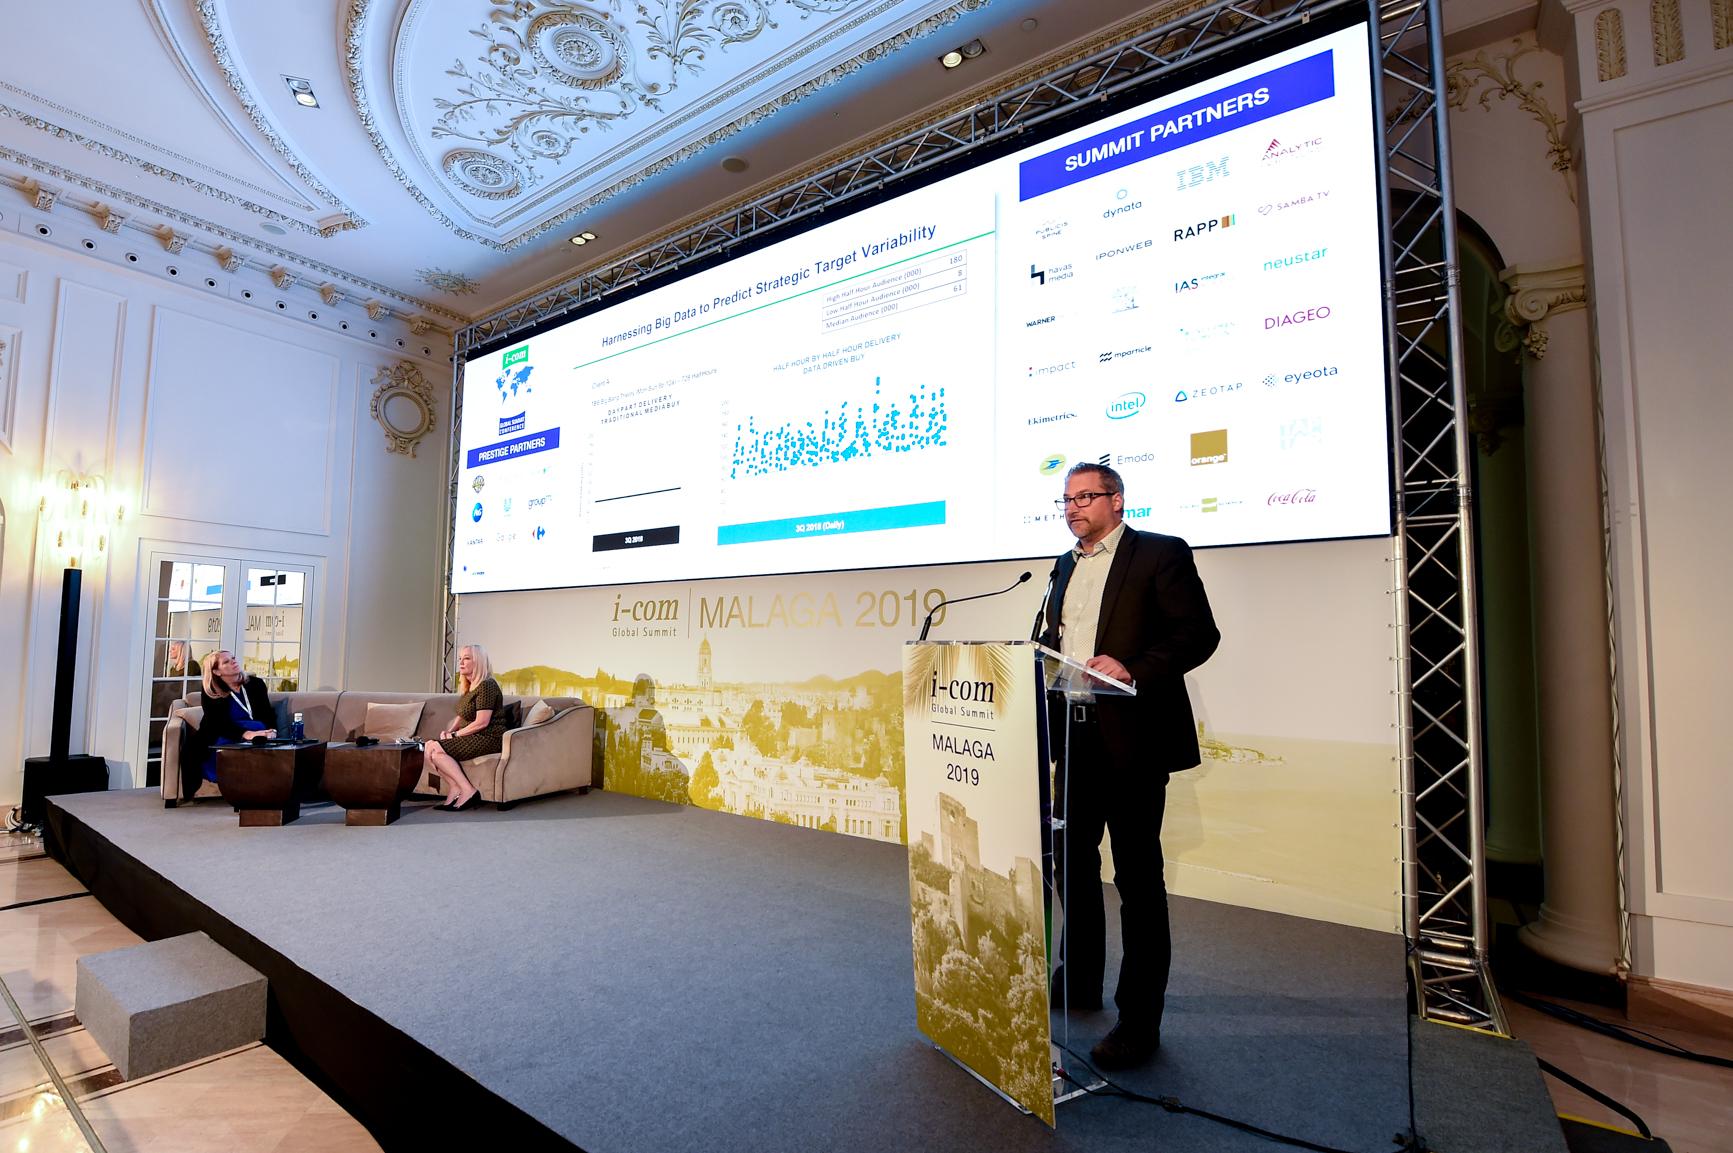 I-COM Global Summit 2019, Malaga